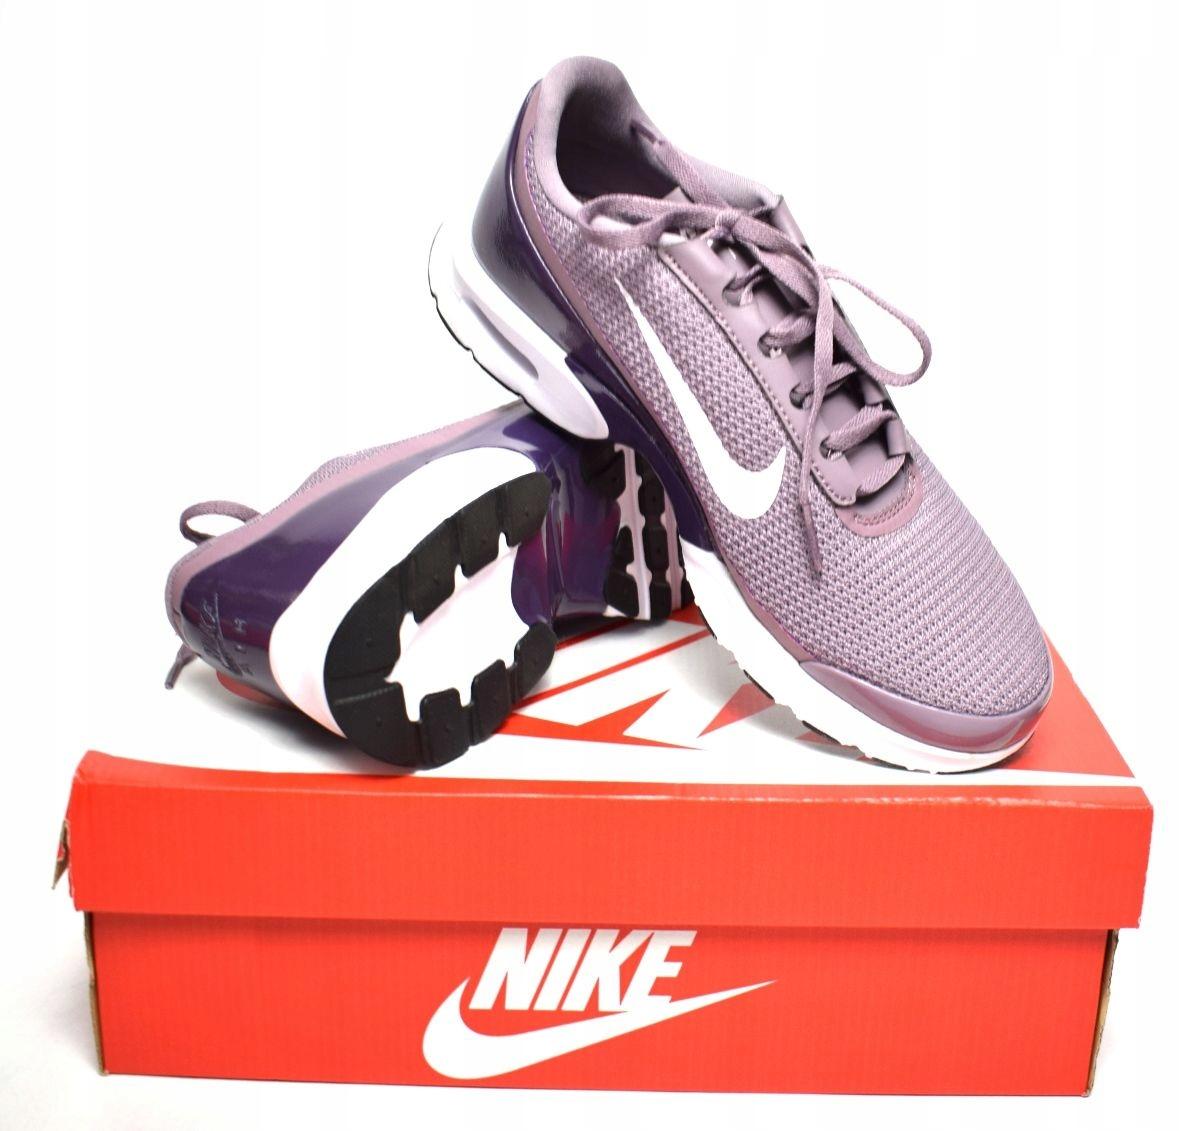 Nike AIR MAX JEWELL BUTY SPORTOWE damskie 40 7375149518